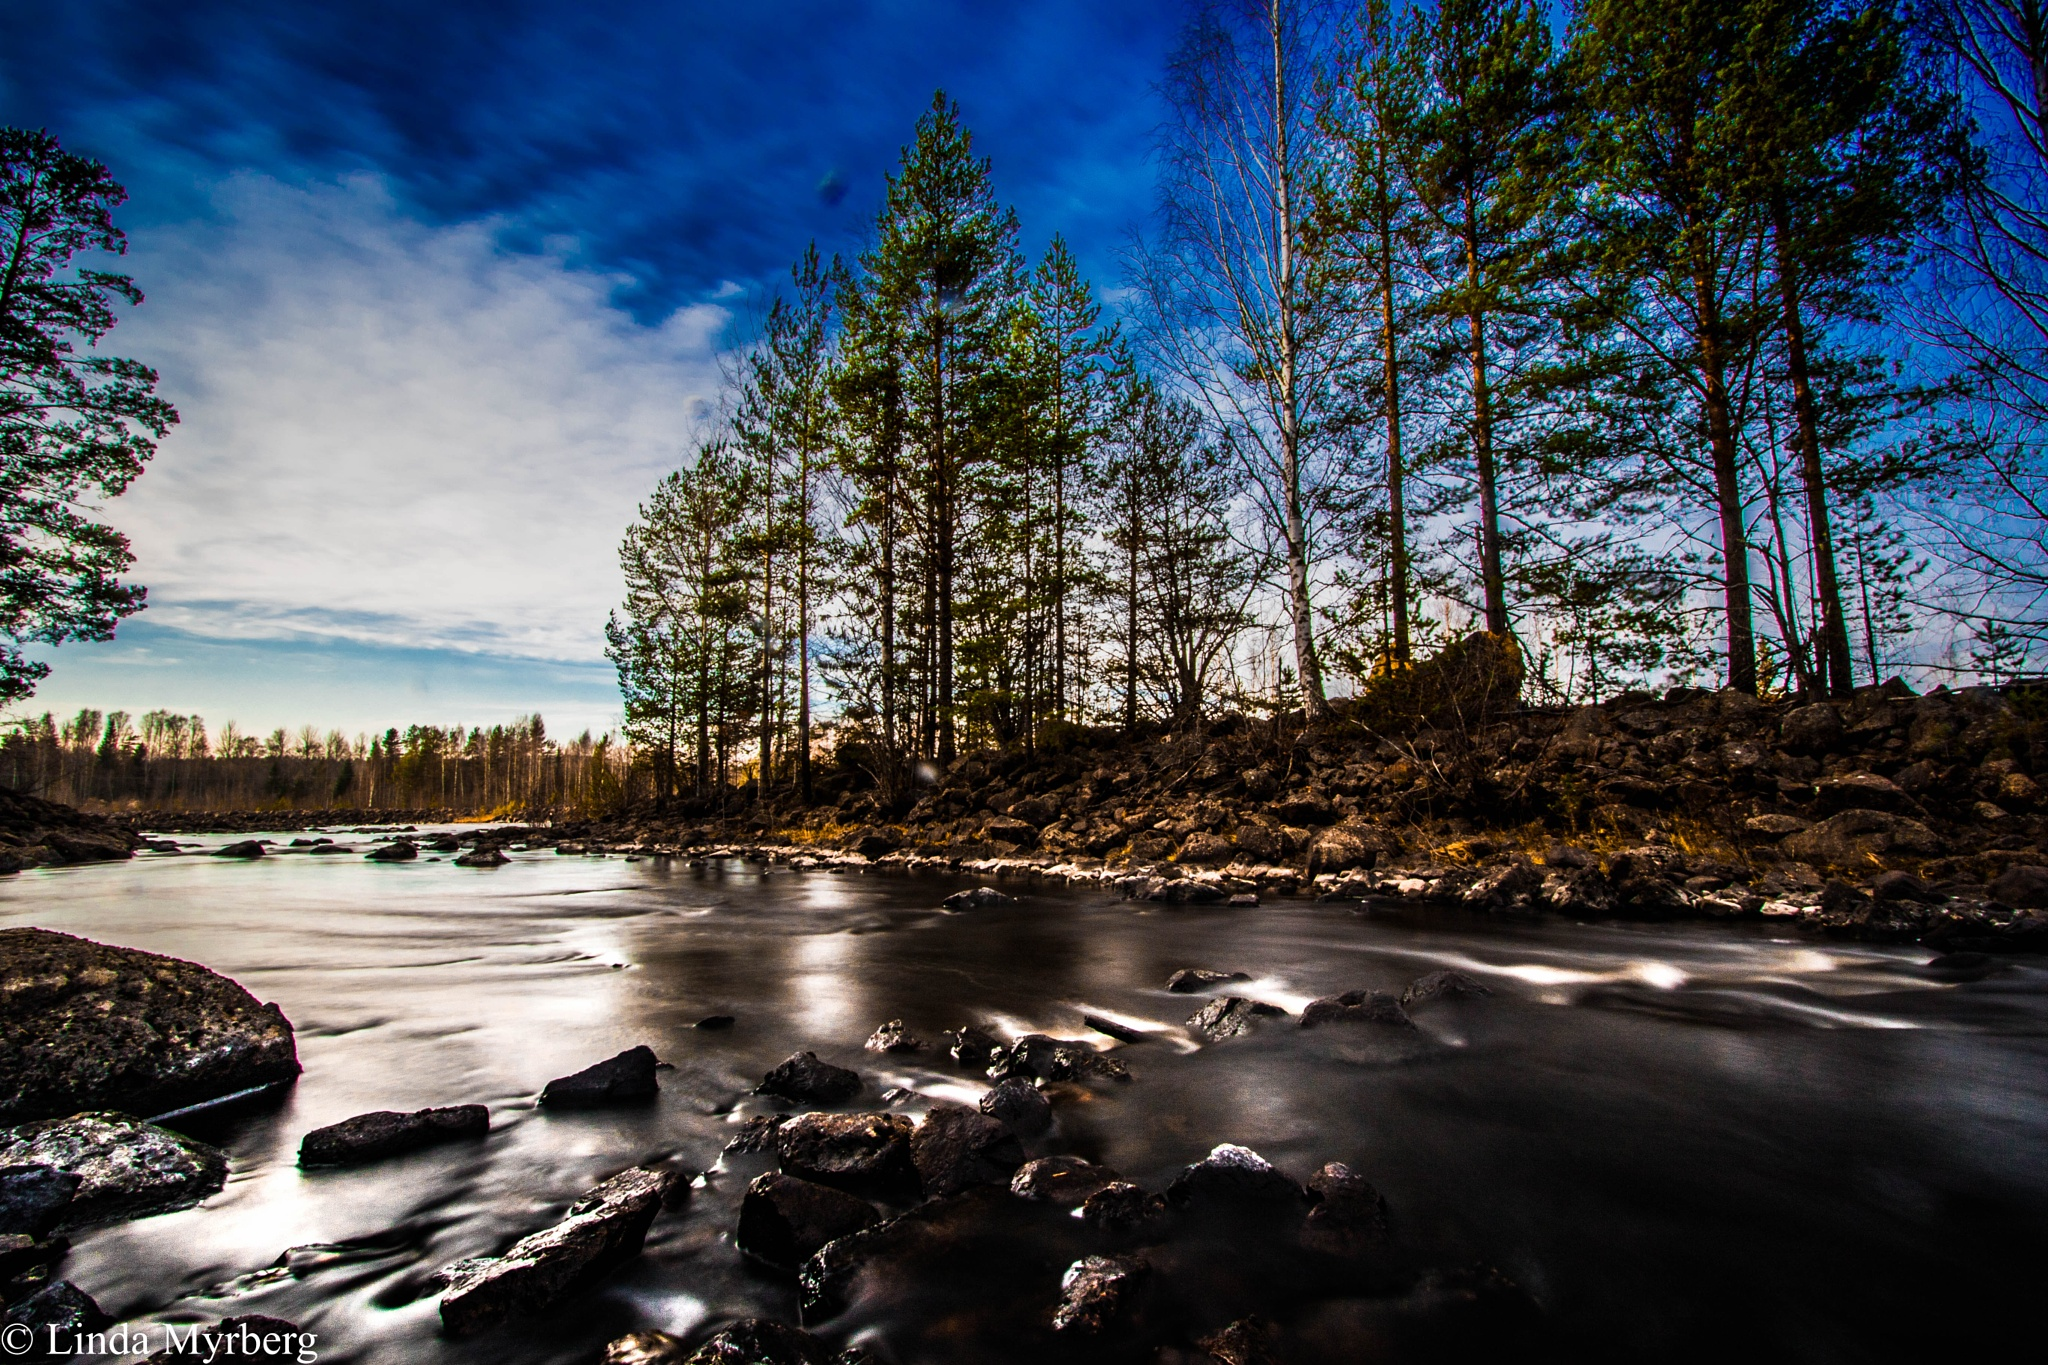 River Ljusnan by Linda Myrberg